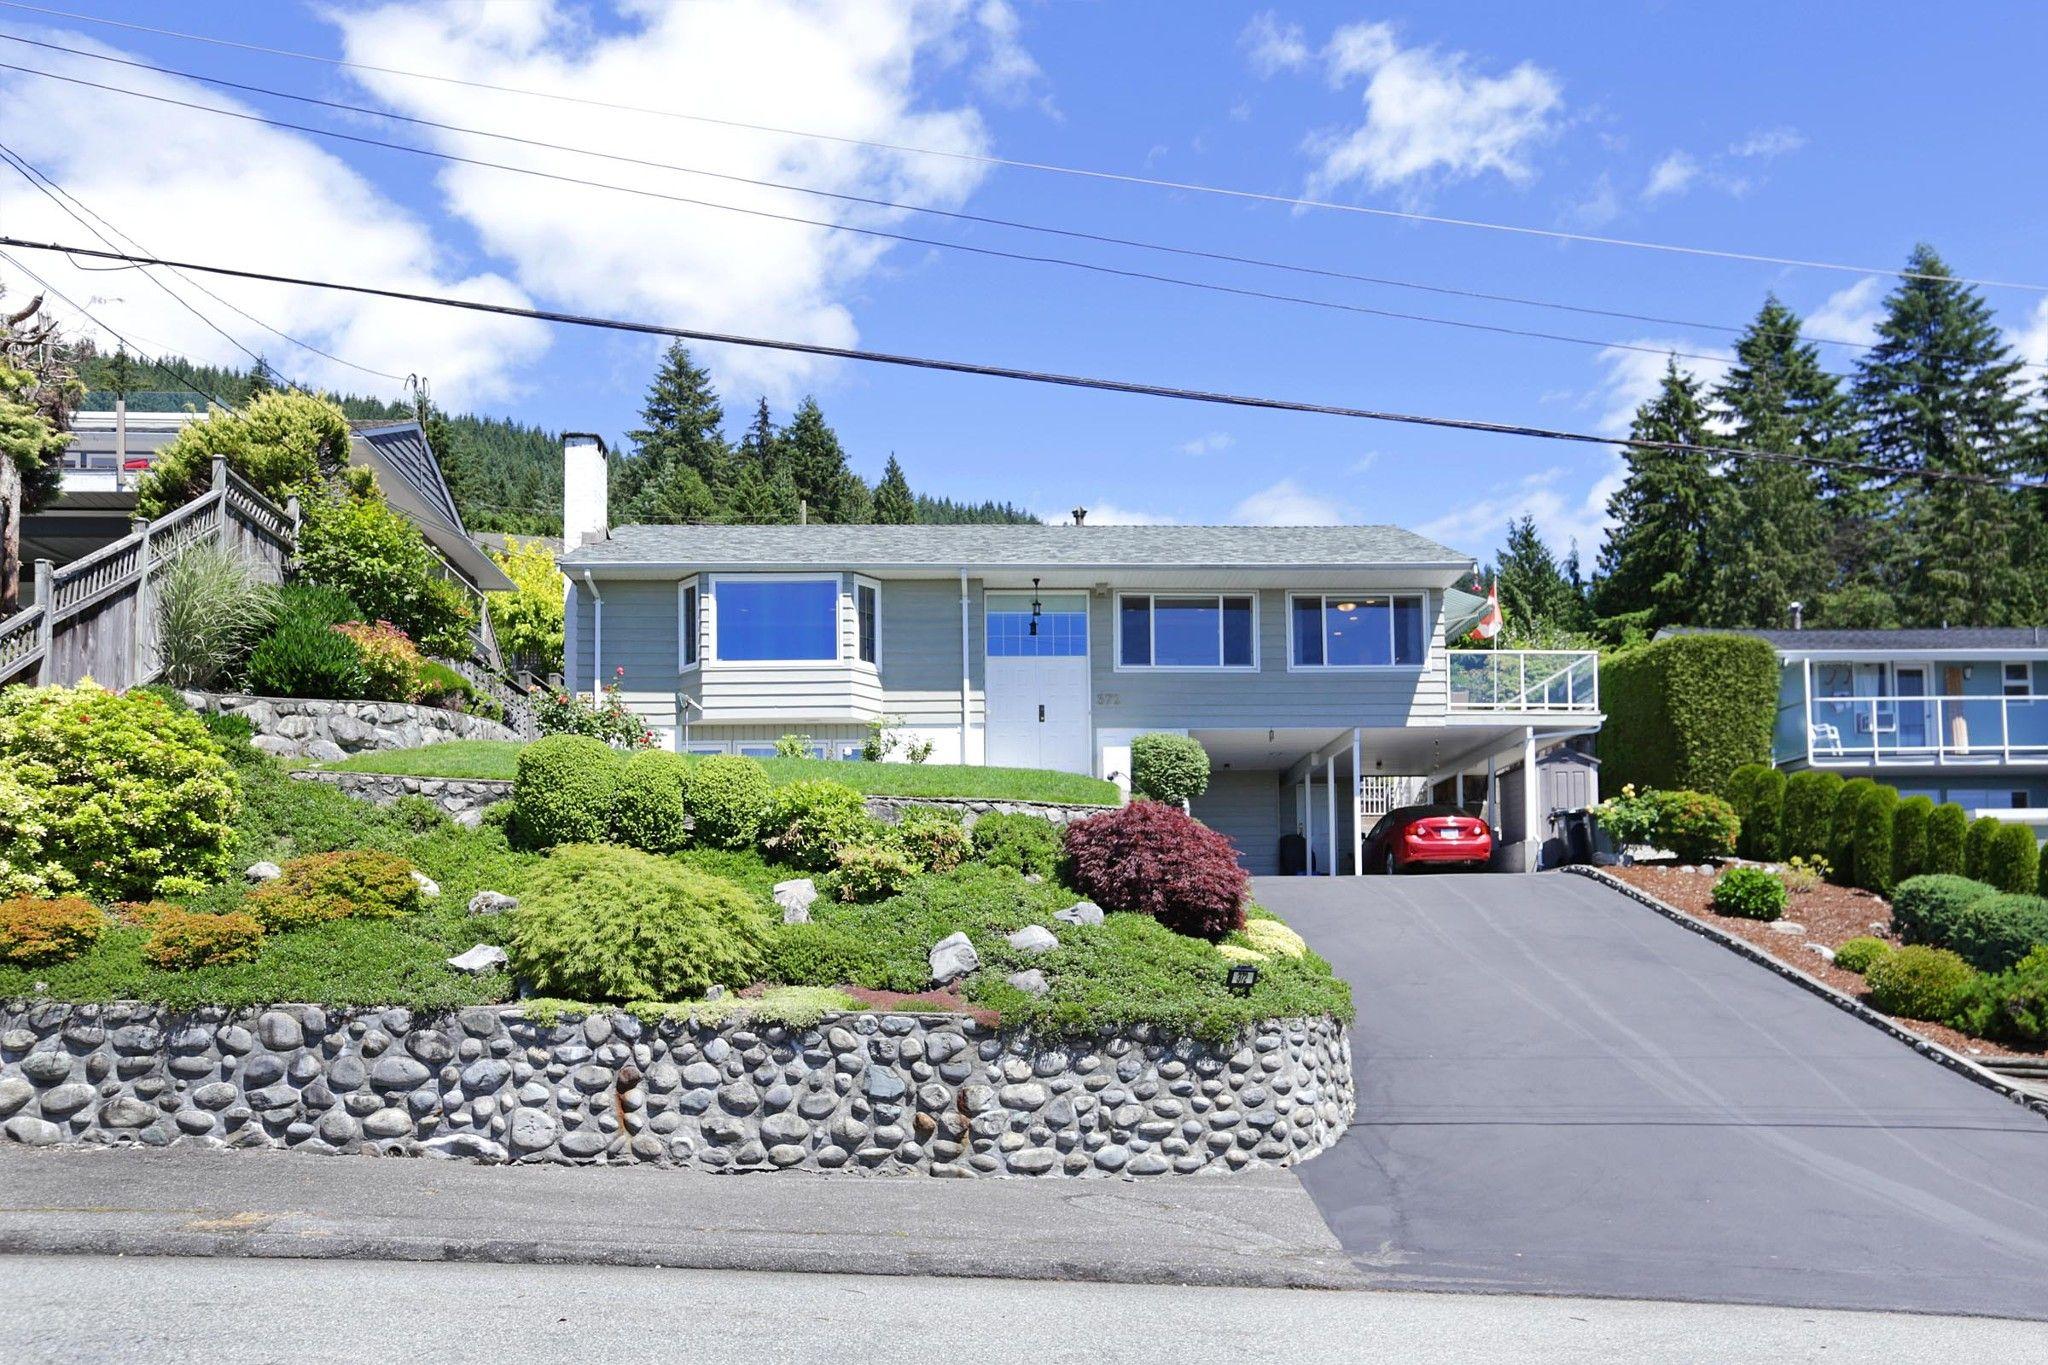 Main Photo: 372 VENTURA Crescent in North Vancouver: Upper Delbrook House for sale : MLS®# R2284717